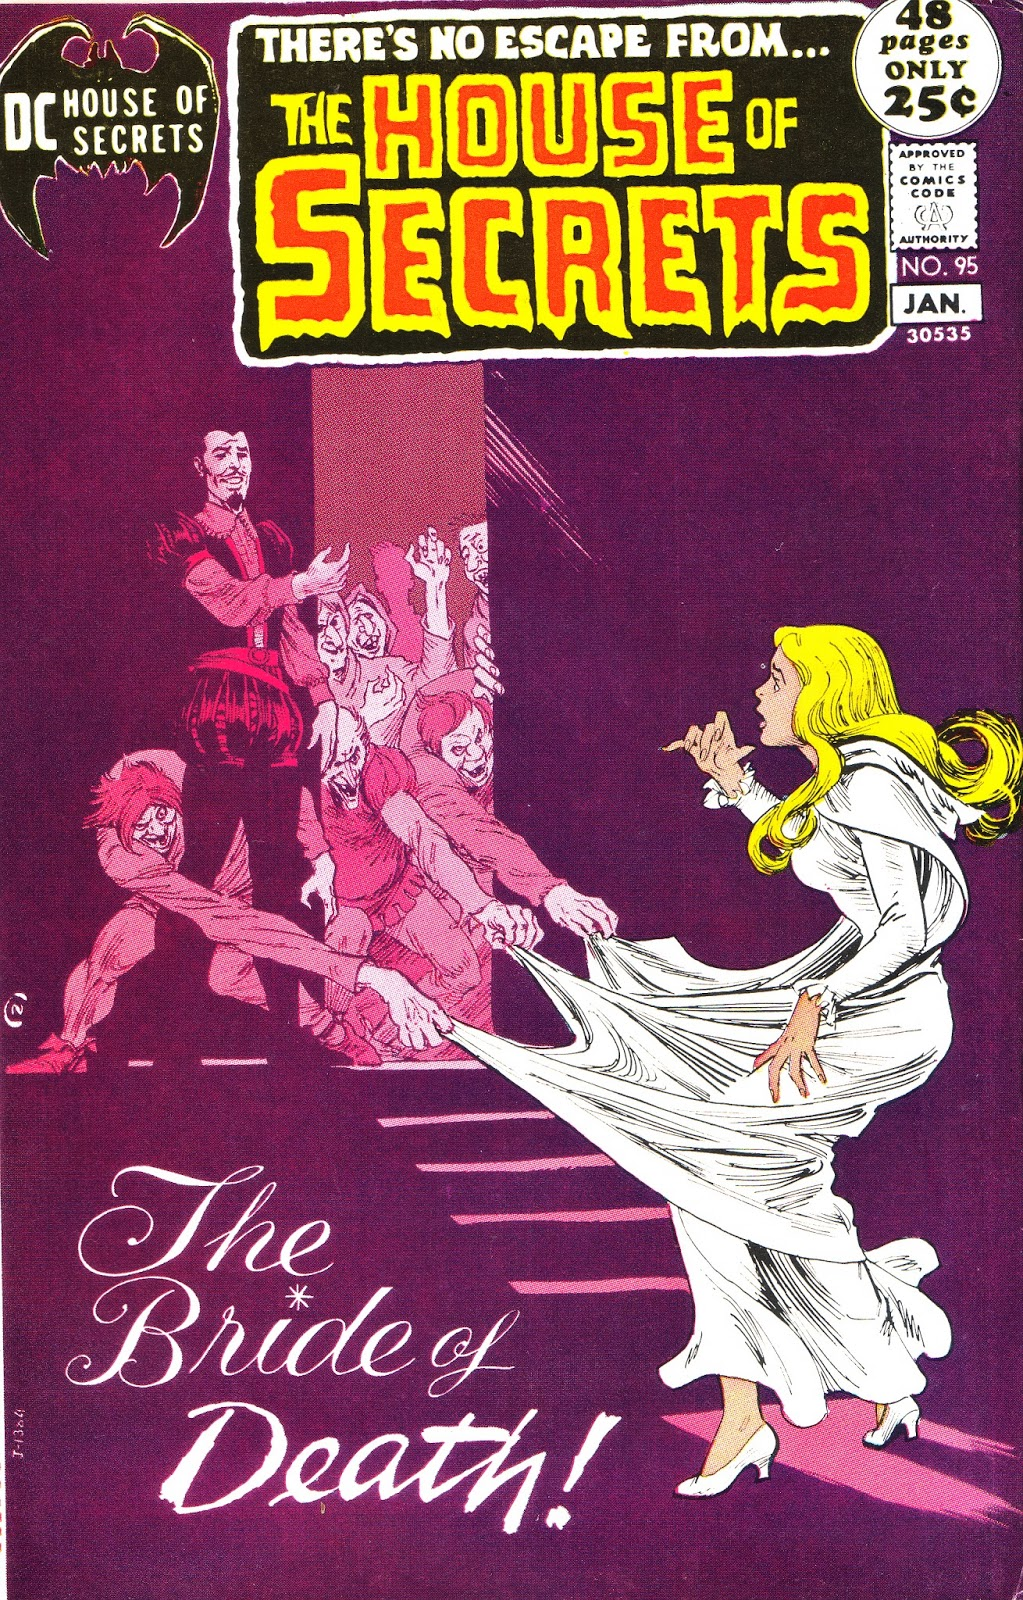 Marvel Mysteries and Comics Minutiae: Exploring the House of Secrets